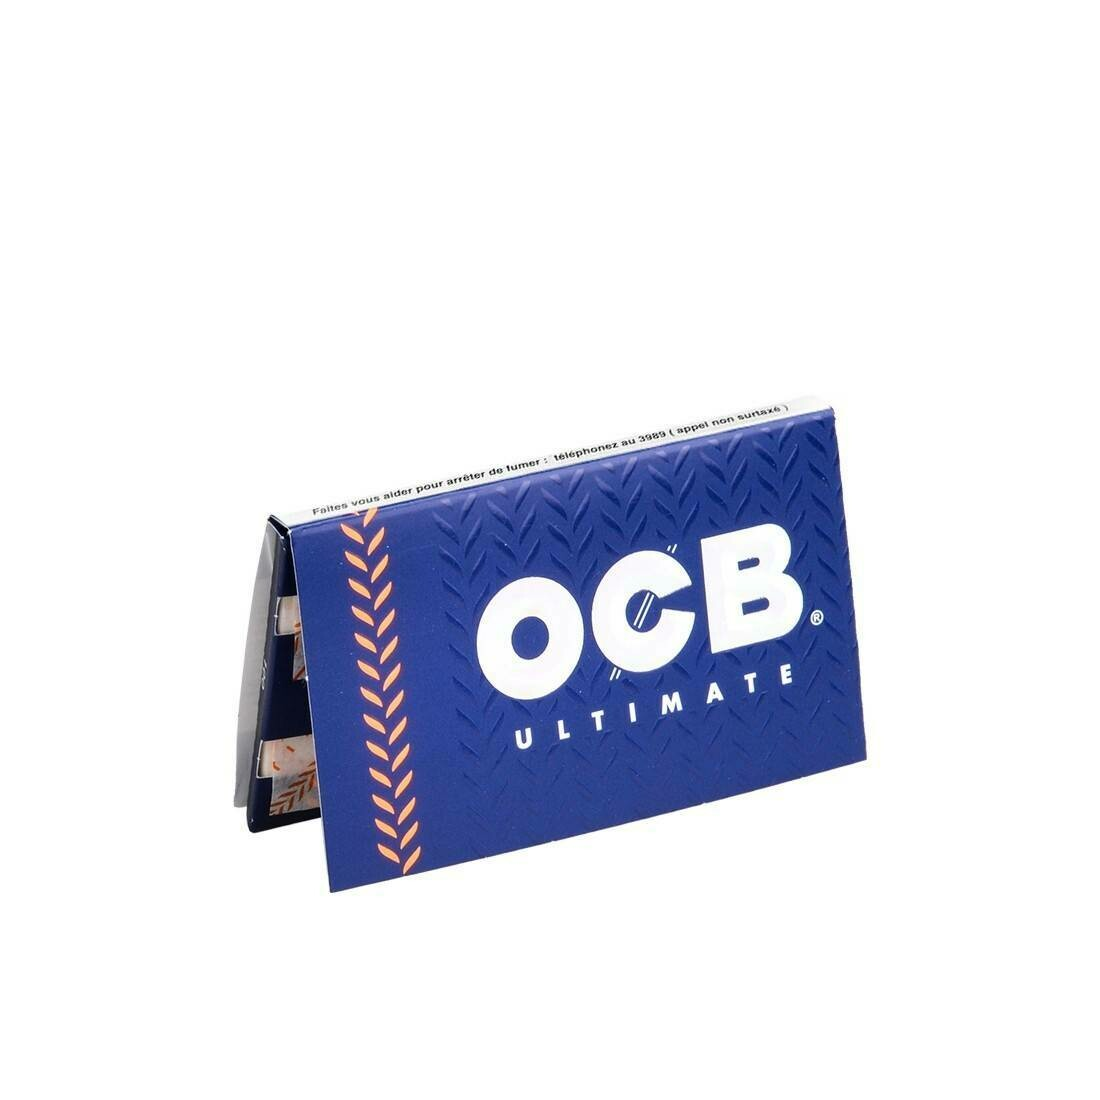 OCB - Double Ultimate Slim ( court )